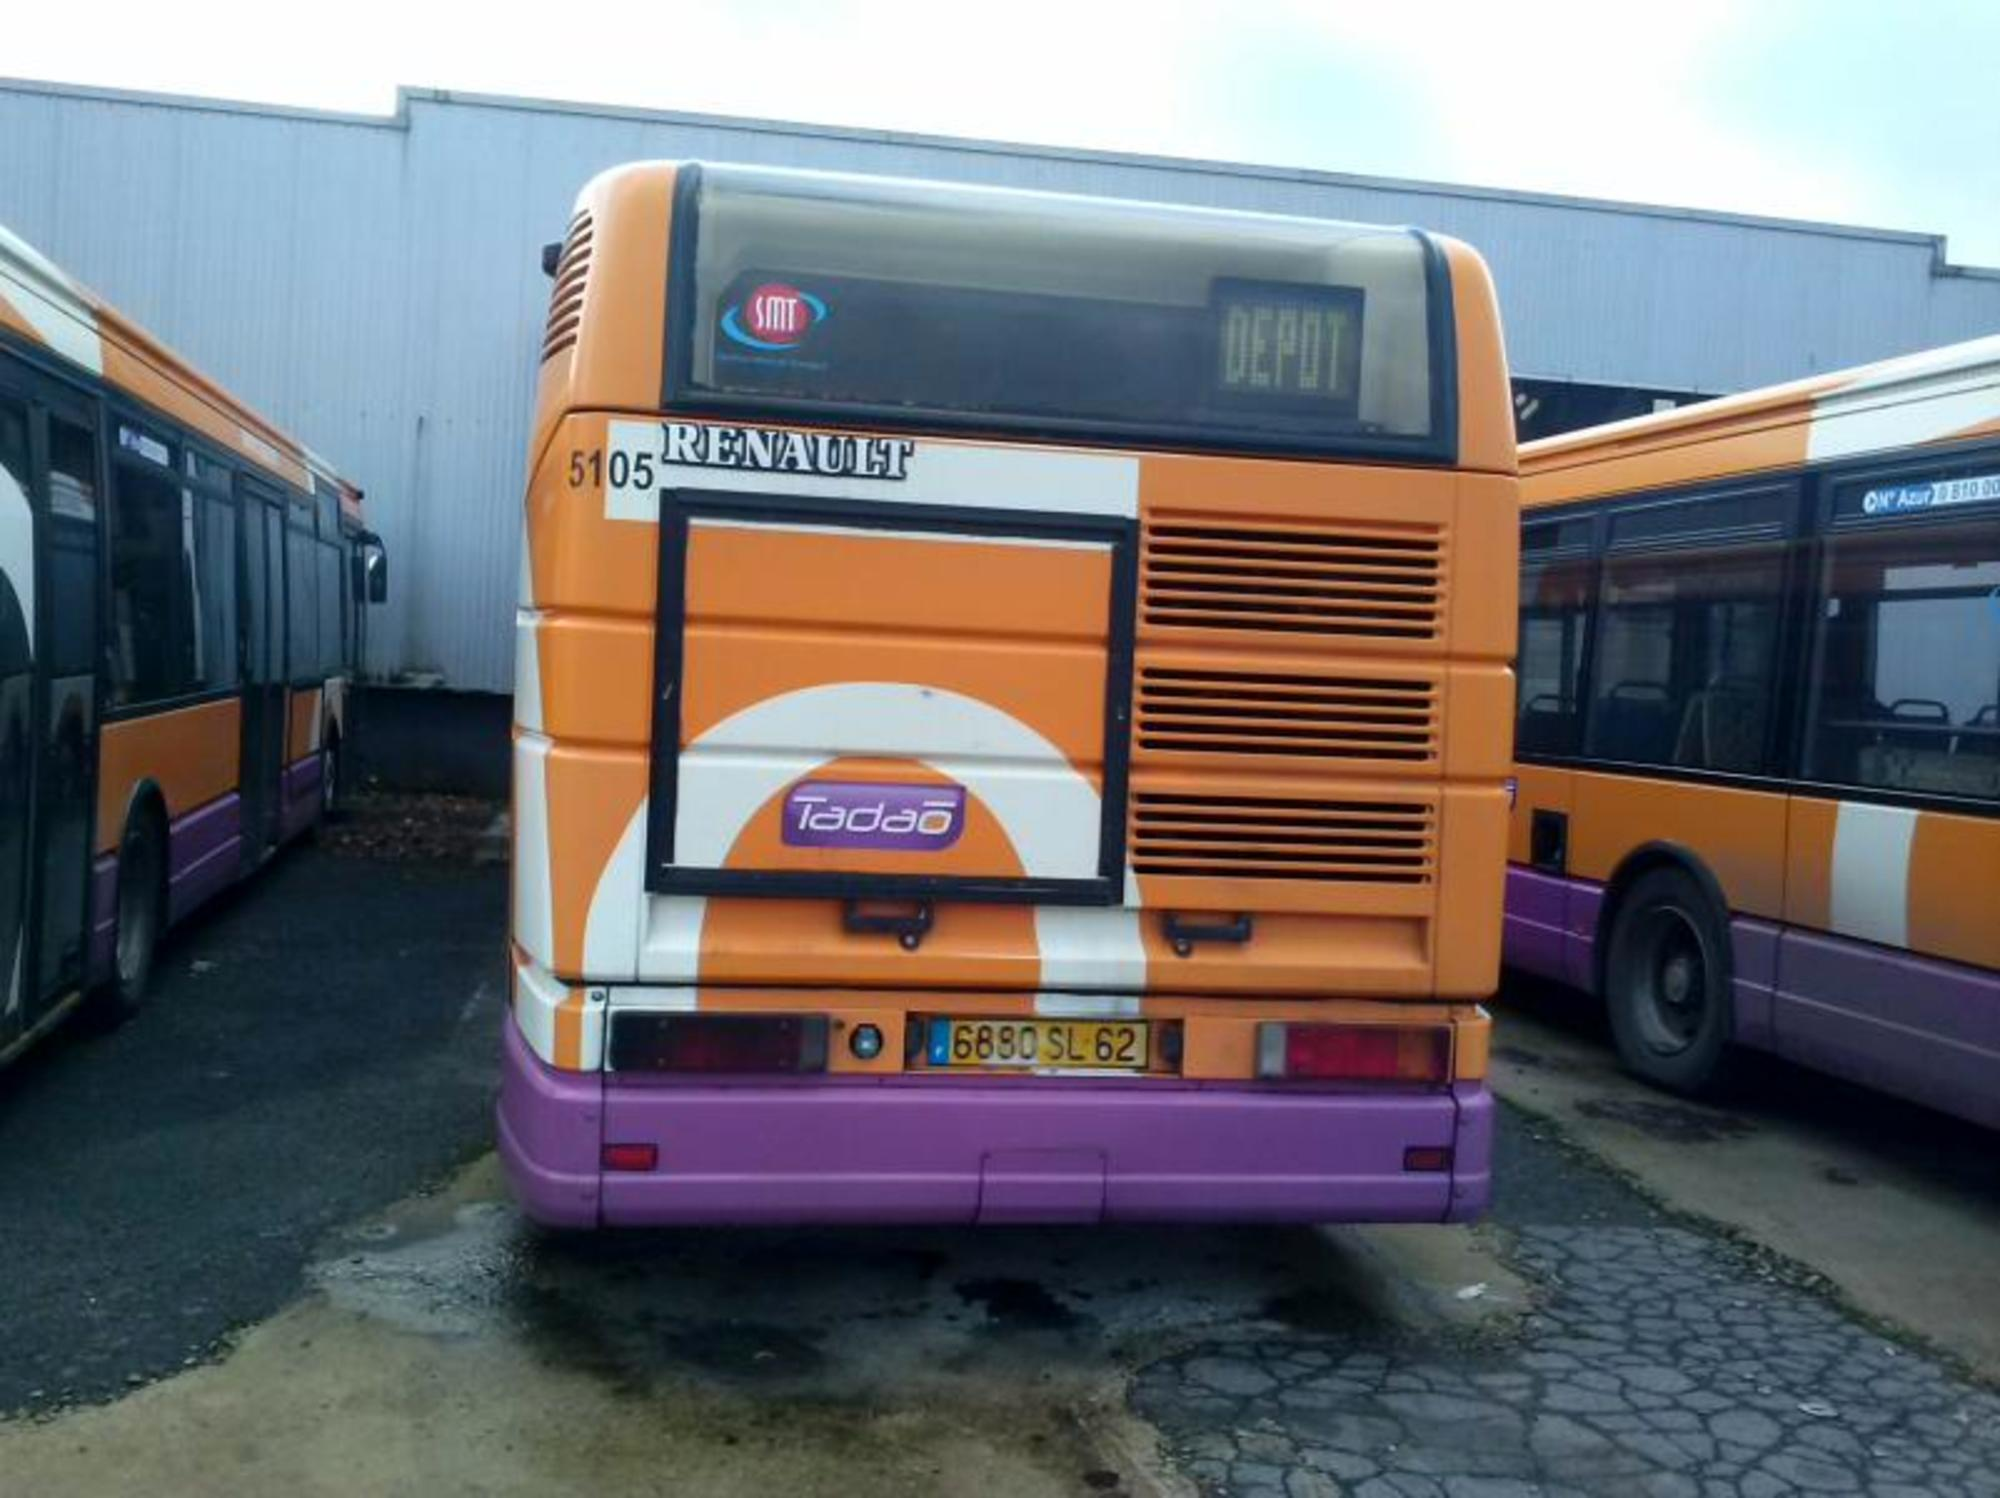 bus urbain renault citybus lot n 1 car bus d 39 occasion aux ench res agorastore. Black Bedroom Furniture Sets. Home Design Ideas